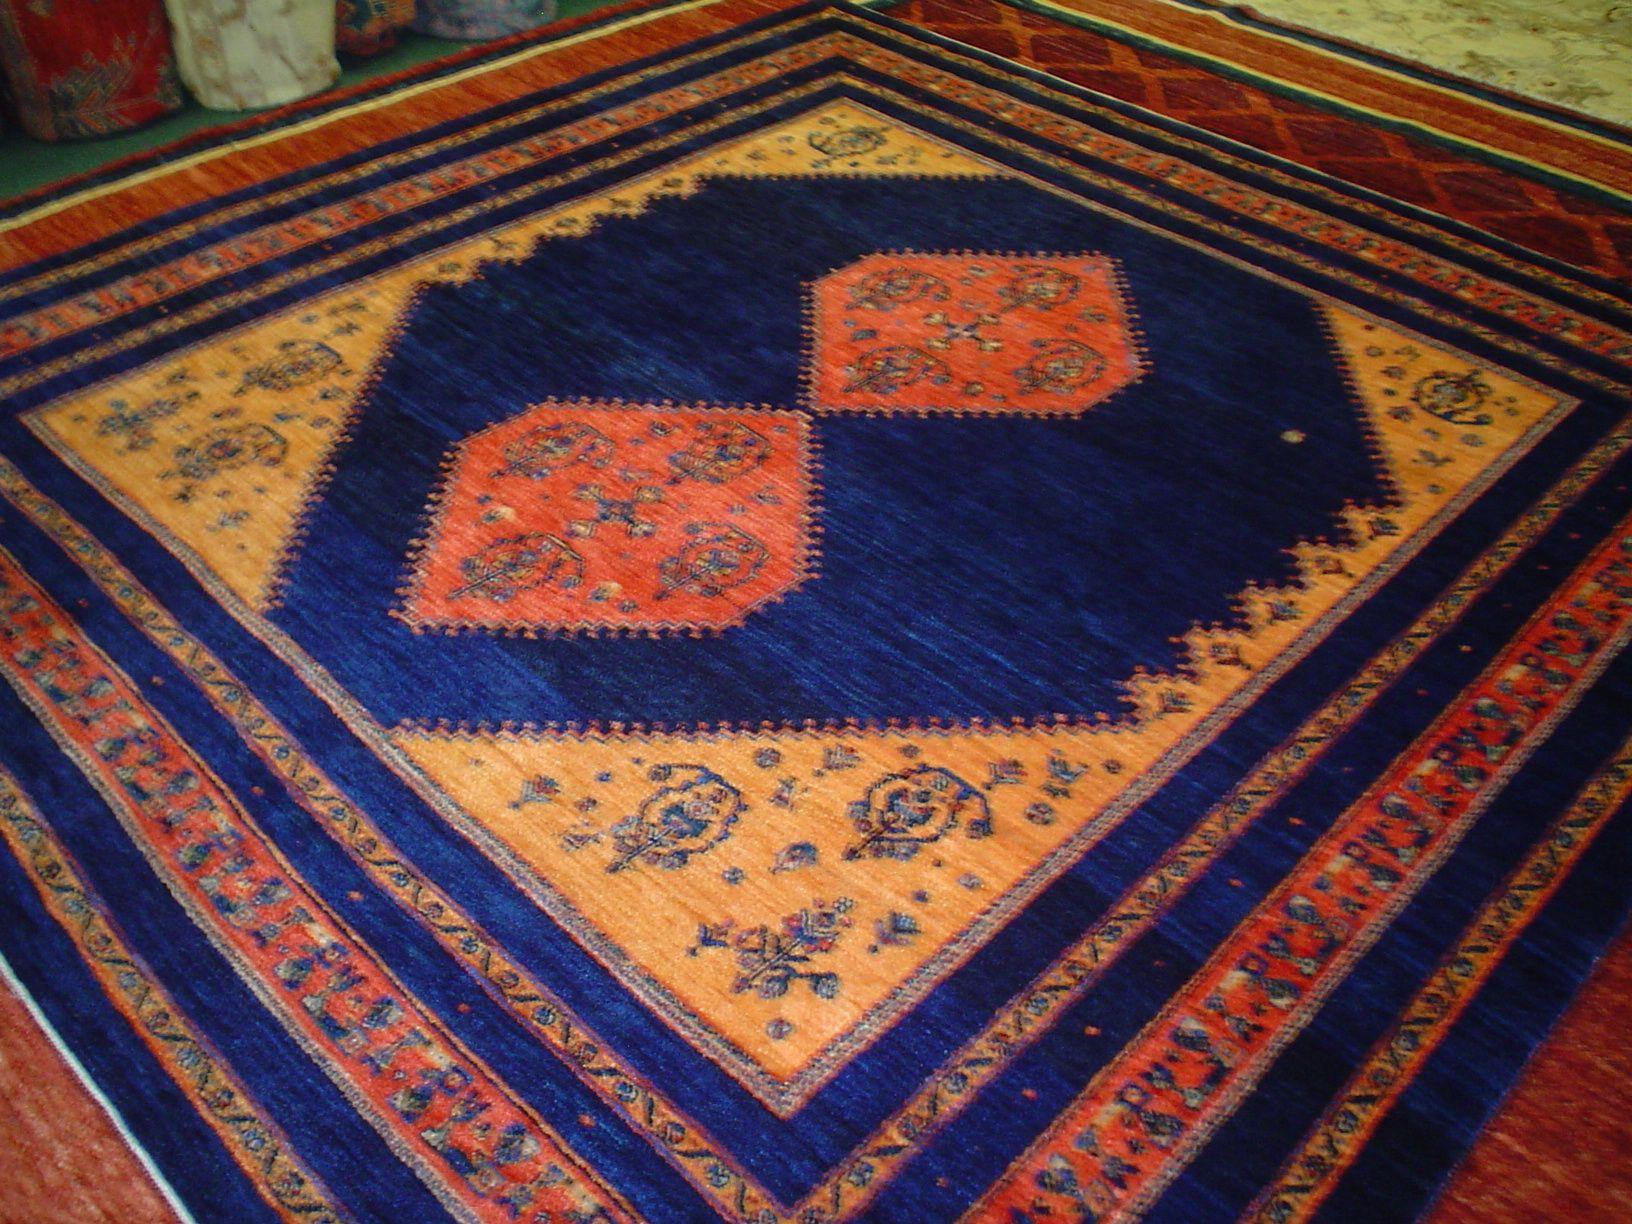 Beautiful Persian Tribal Rug In Jewel Tones